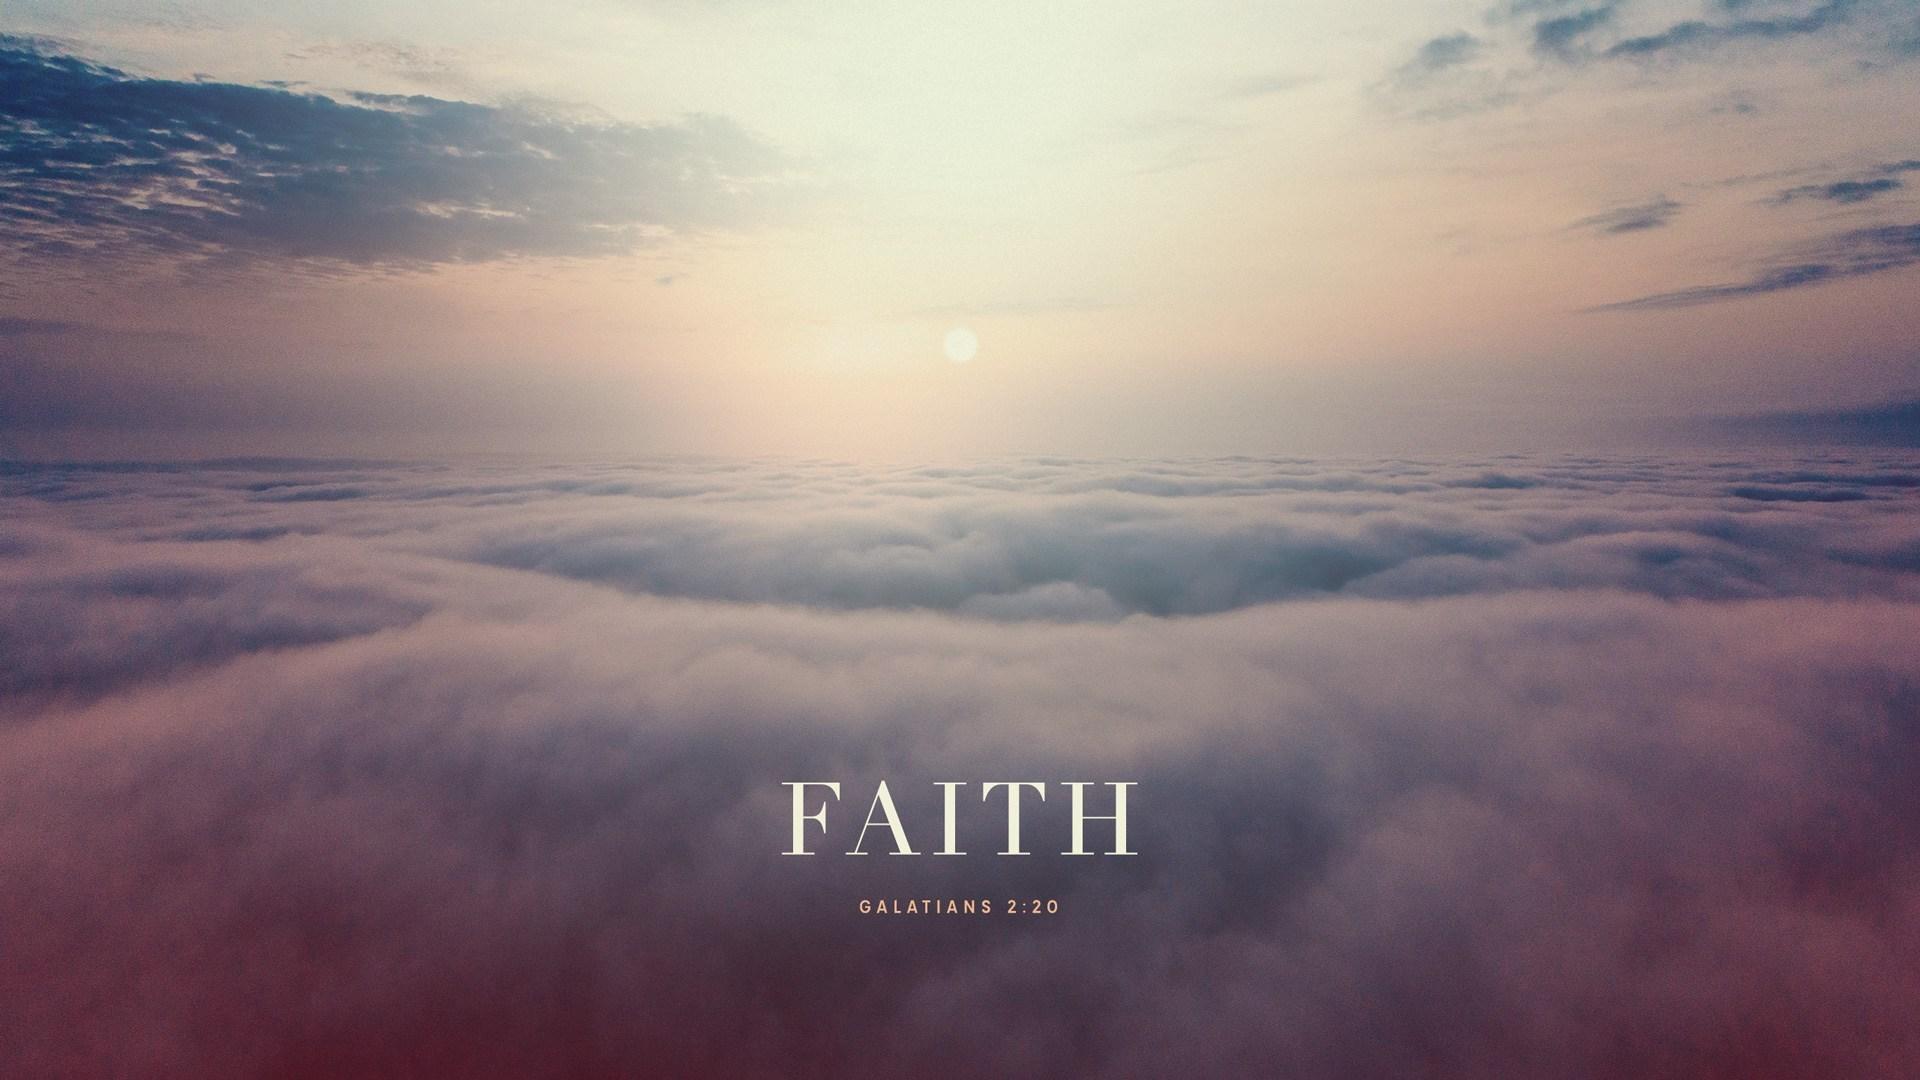 Faith Desktop Wallpapers   Top Faith Desktop Backgrounds 1920x1080